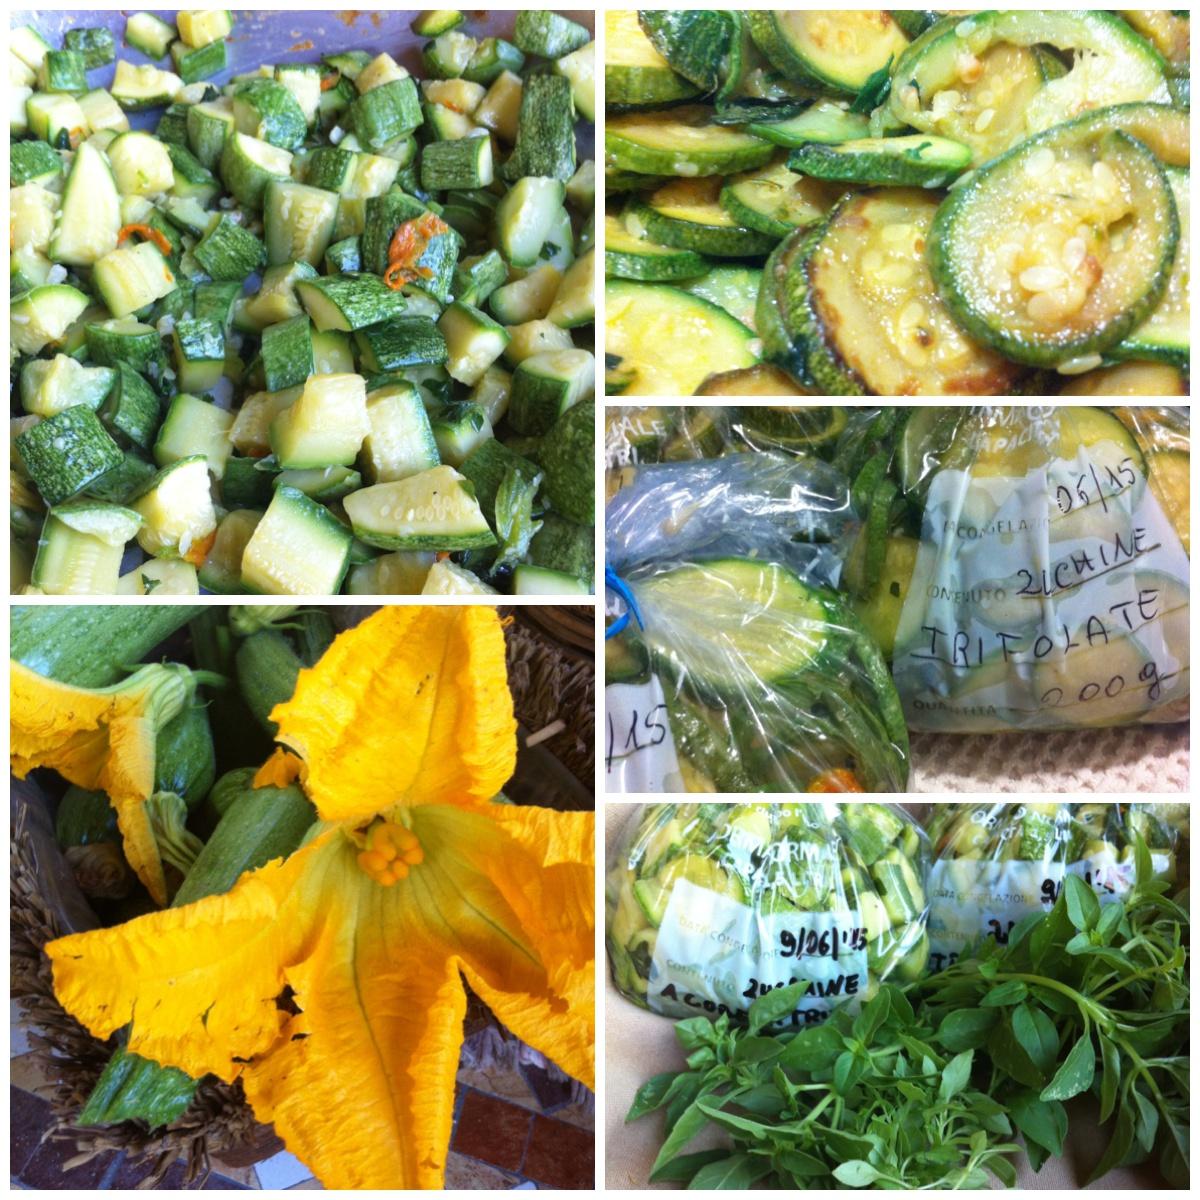 zucchine-trifolate-7.JPG